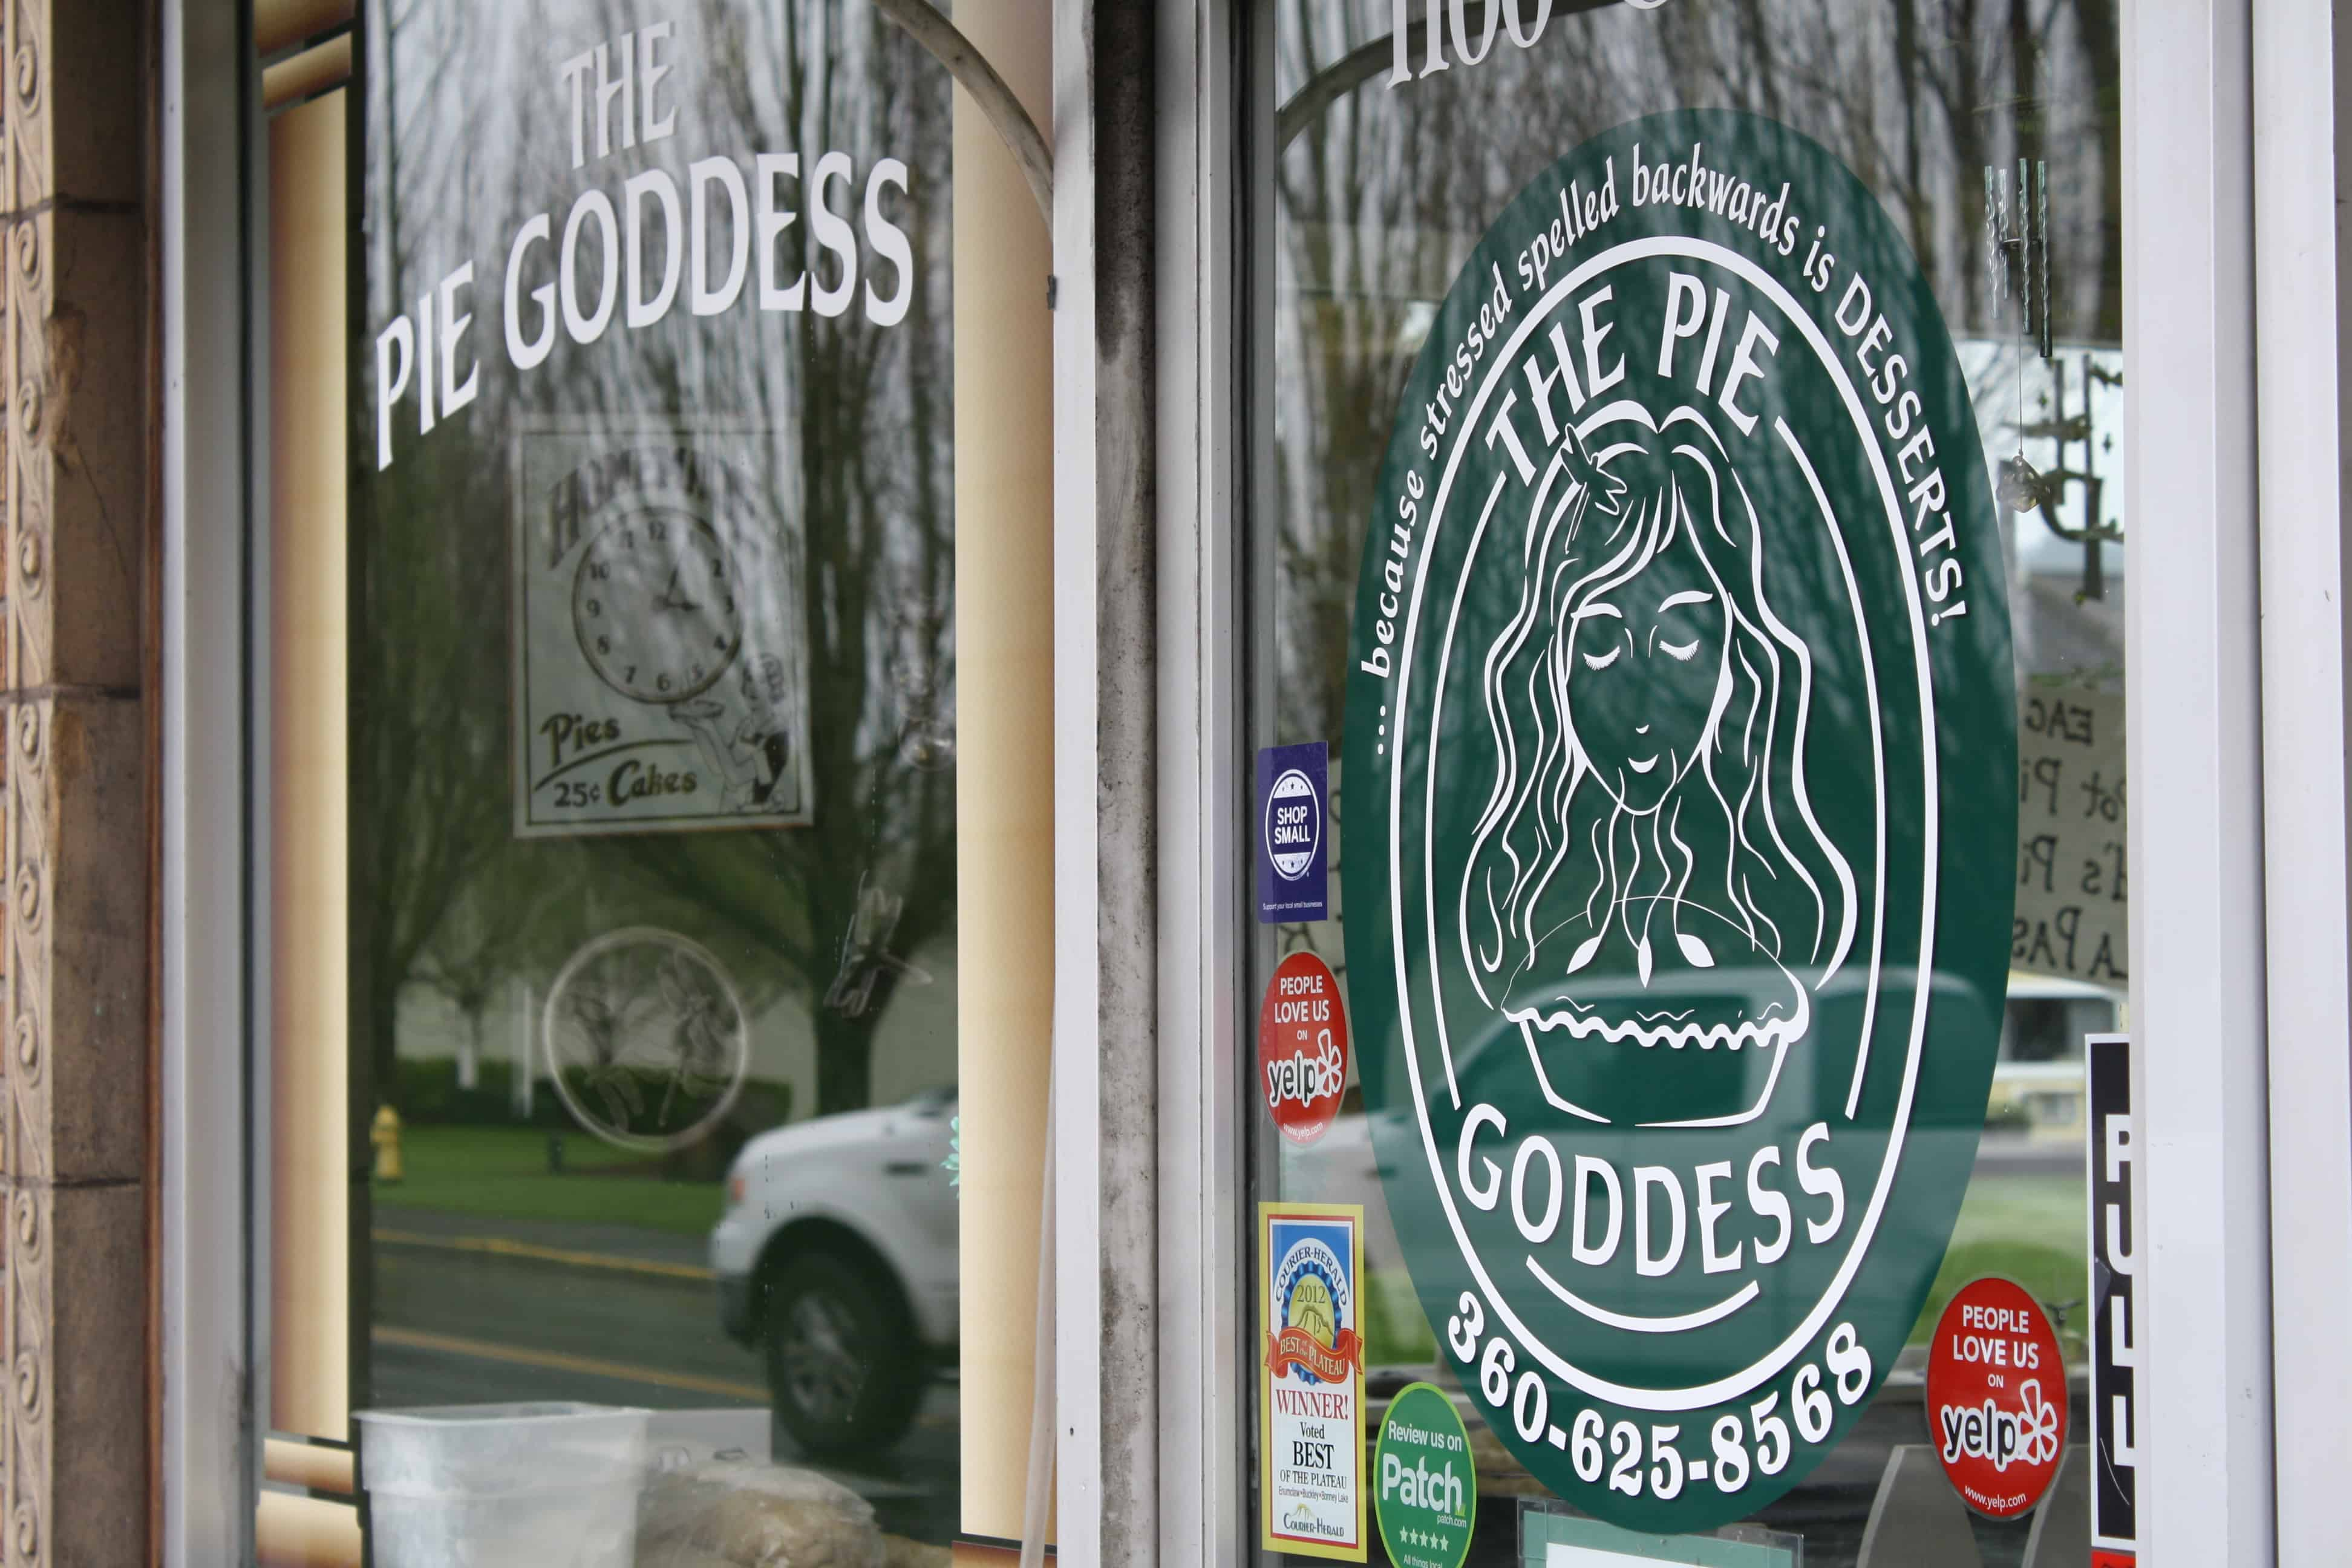 Pie Goddess